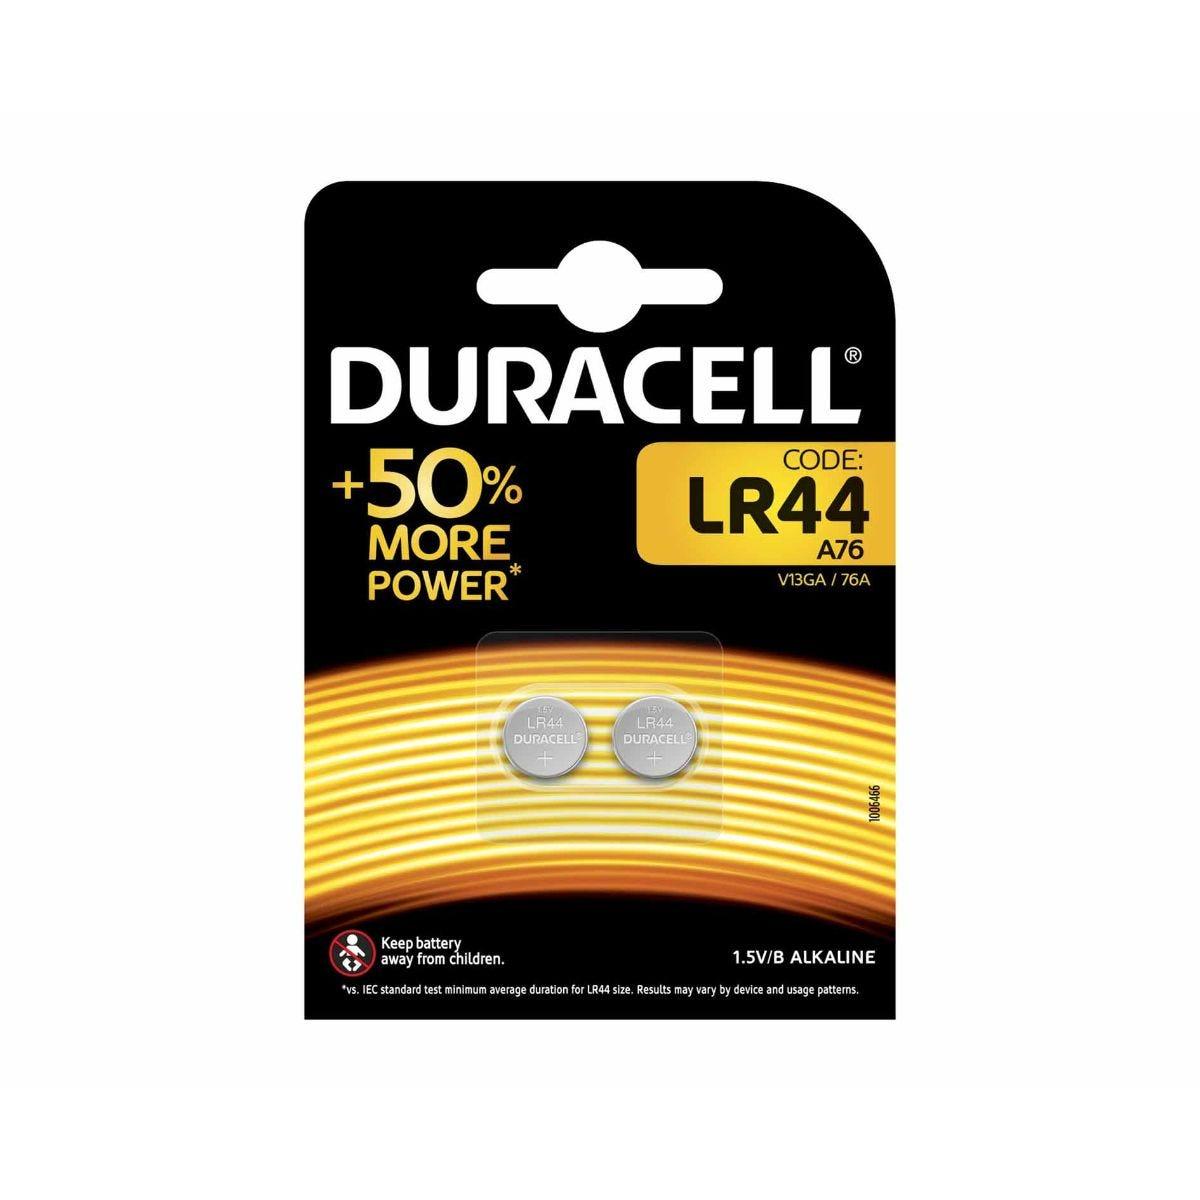 Image of Duracell Batteries LR44 Alkaline Pack of 2